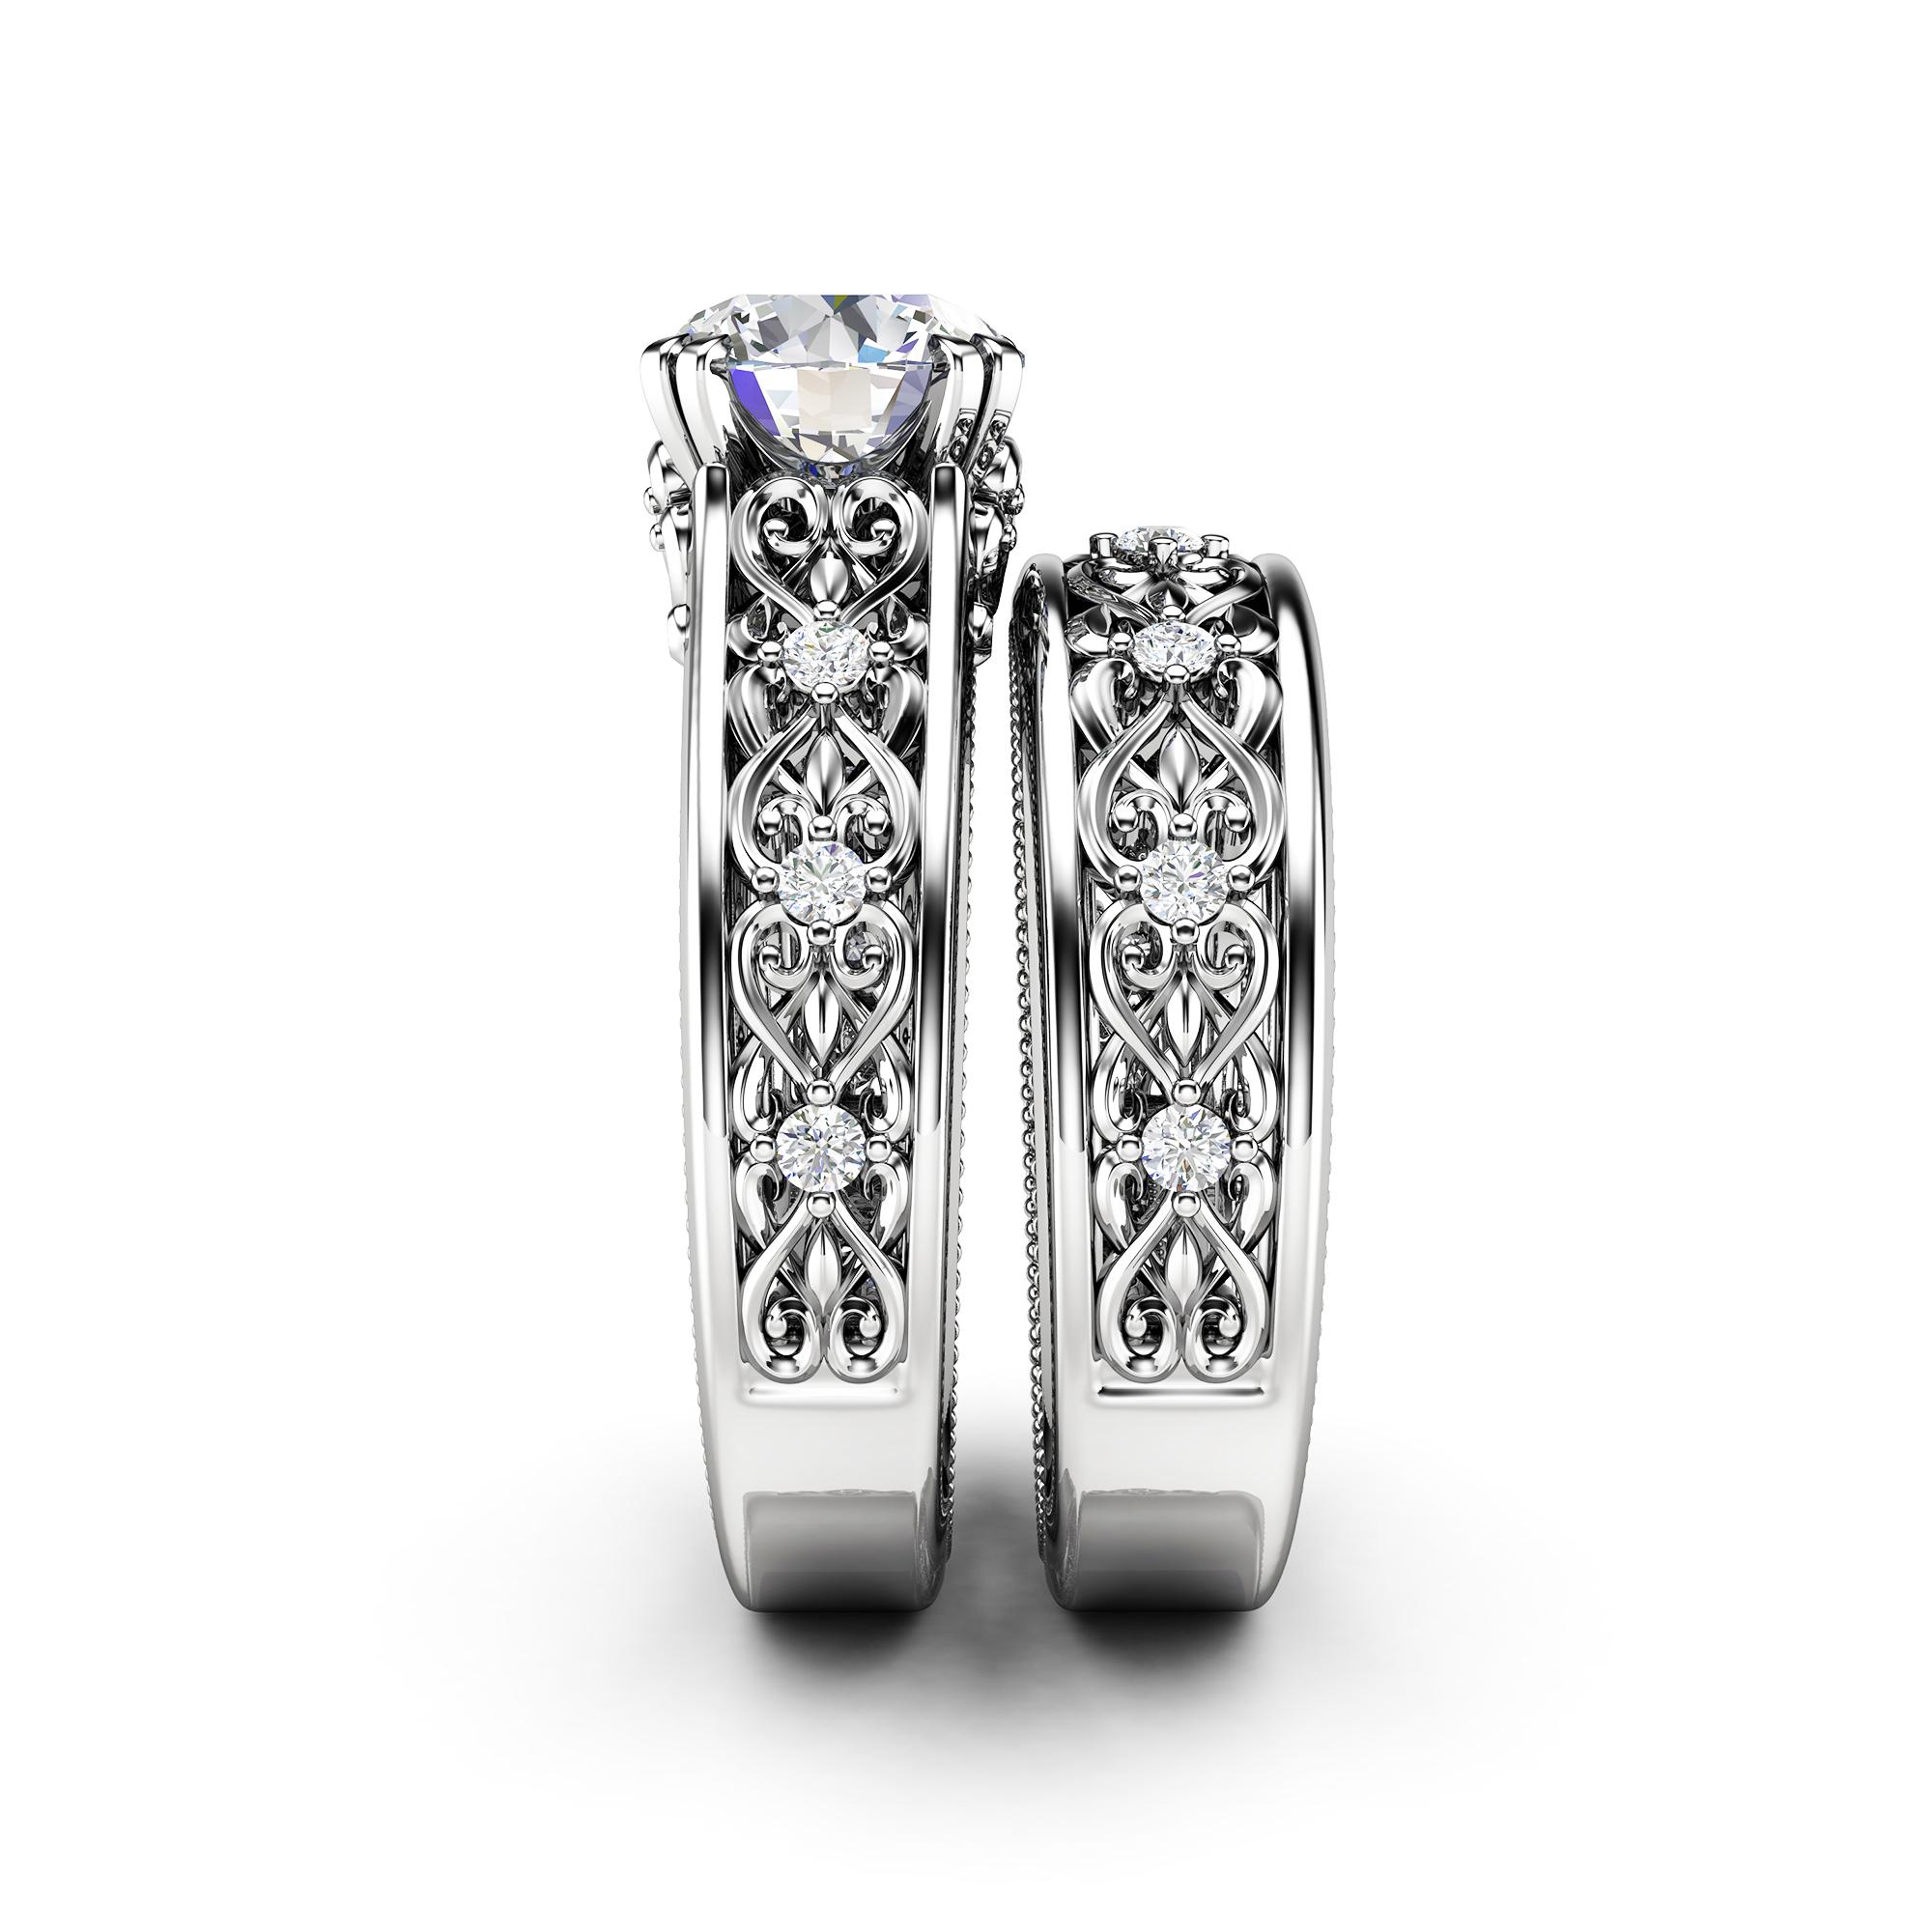 Vintage Moissanite Engagement Ring Set 14K White Gold Ring with Matching Band Art Deco Engagement Ring Set